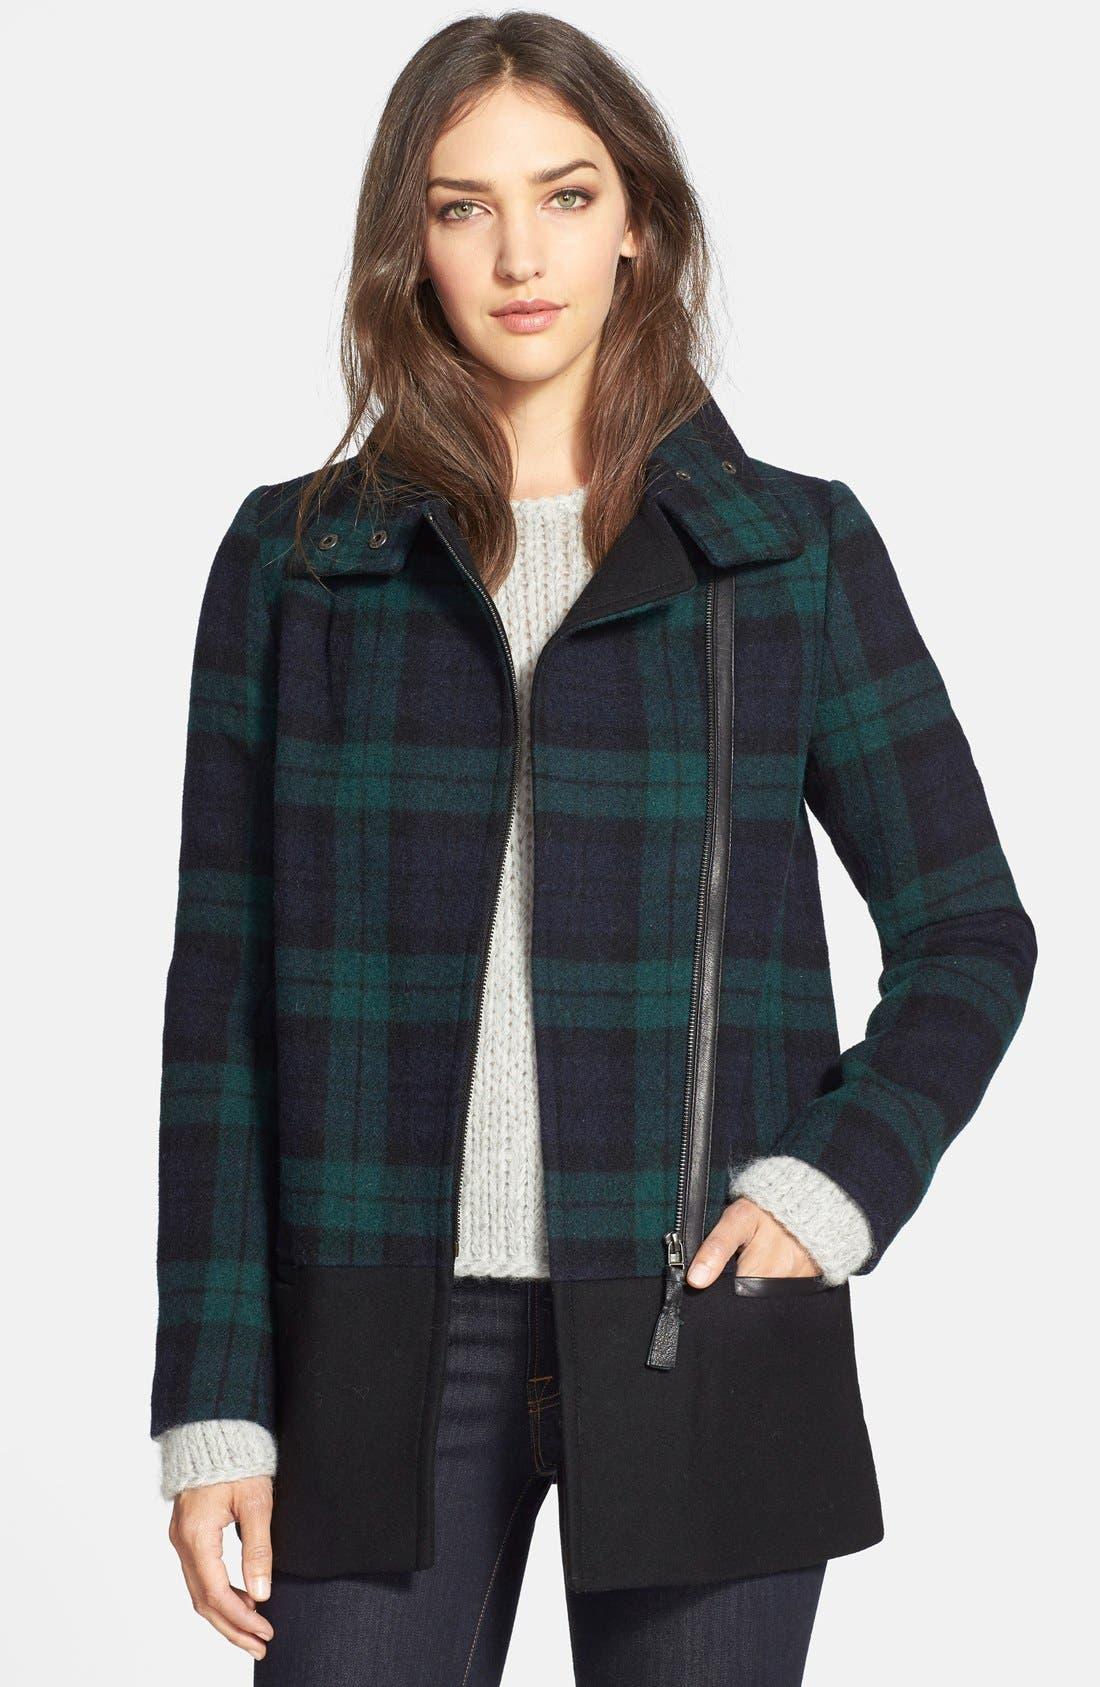 Alternate Image 1 Selected - Mackage 'Berta' Asymmetrical Wool Blend Plaid Coat